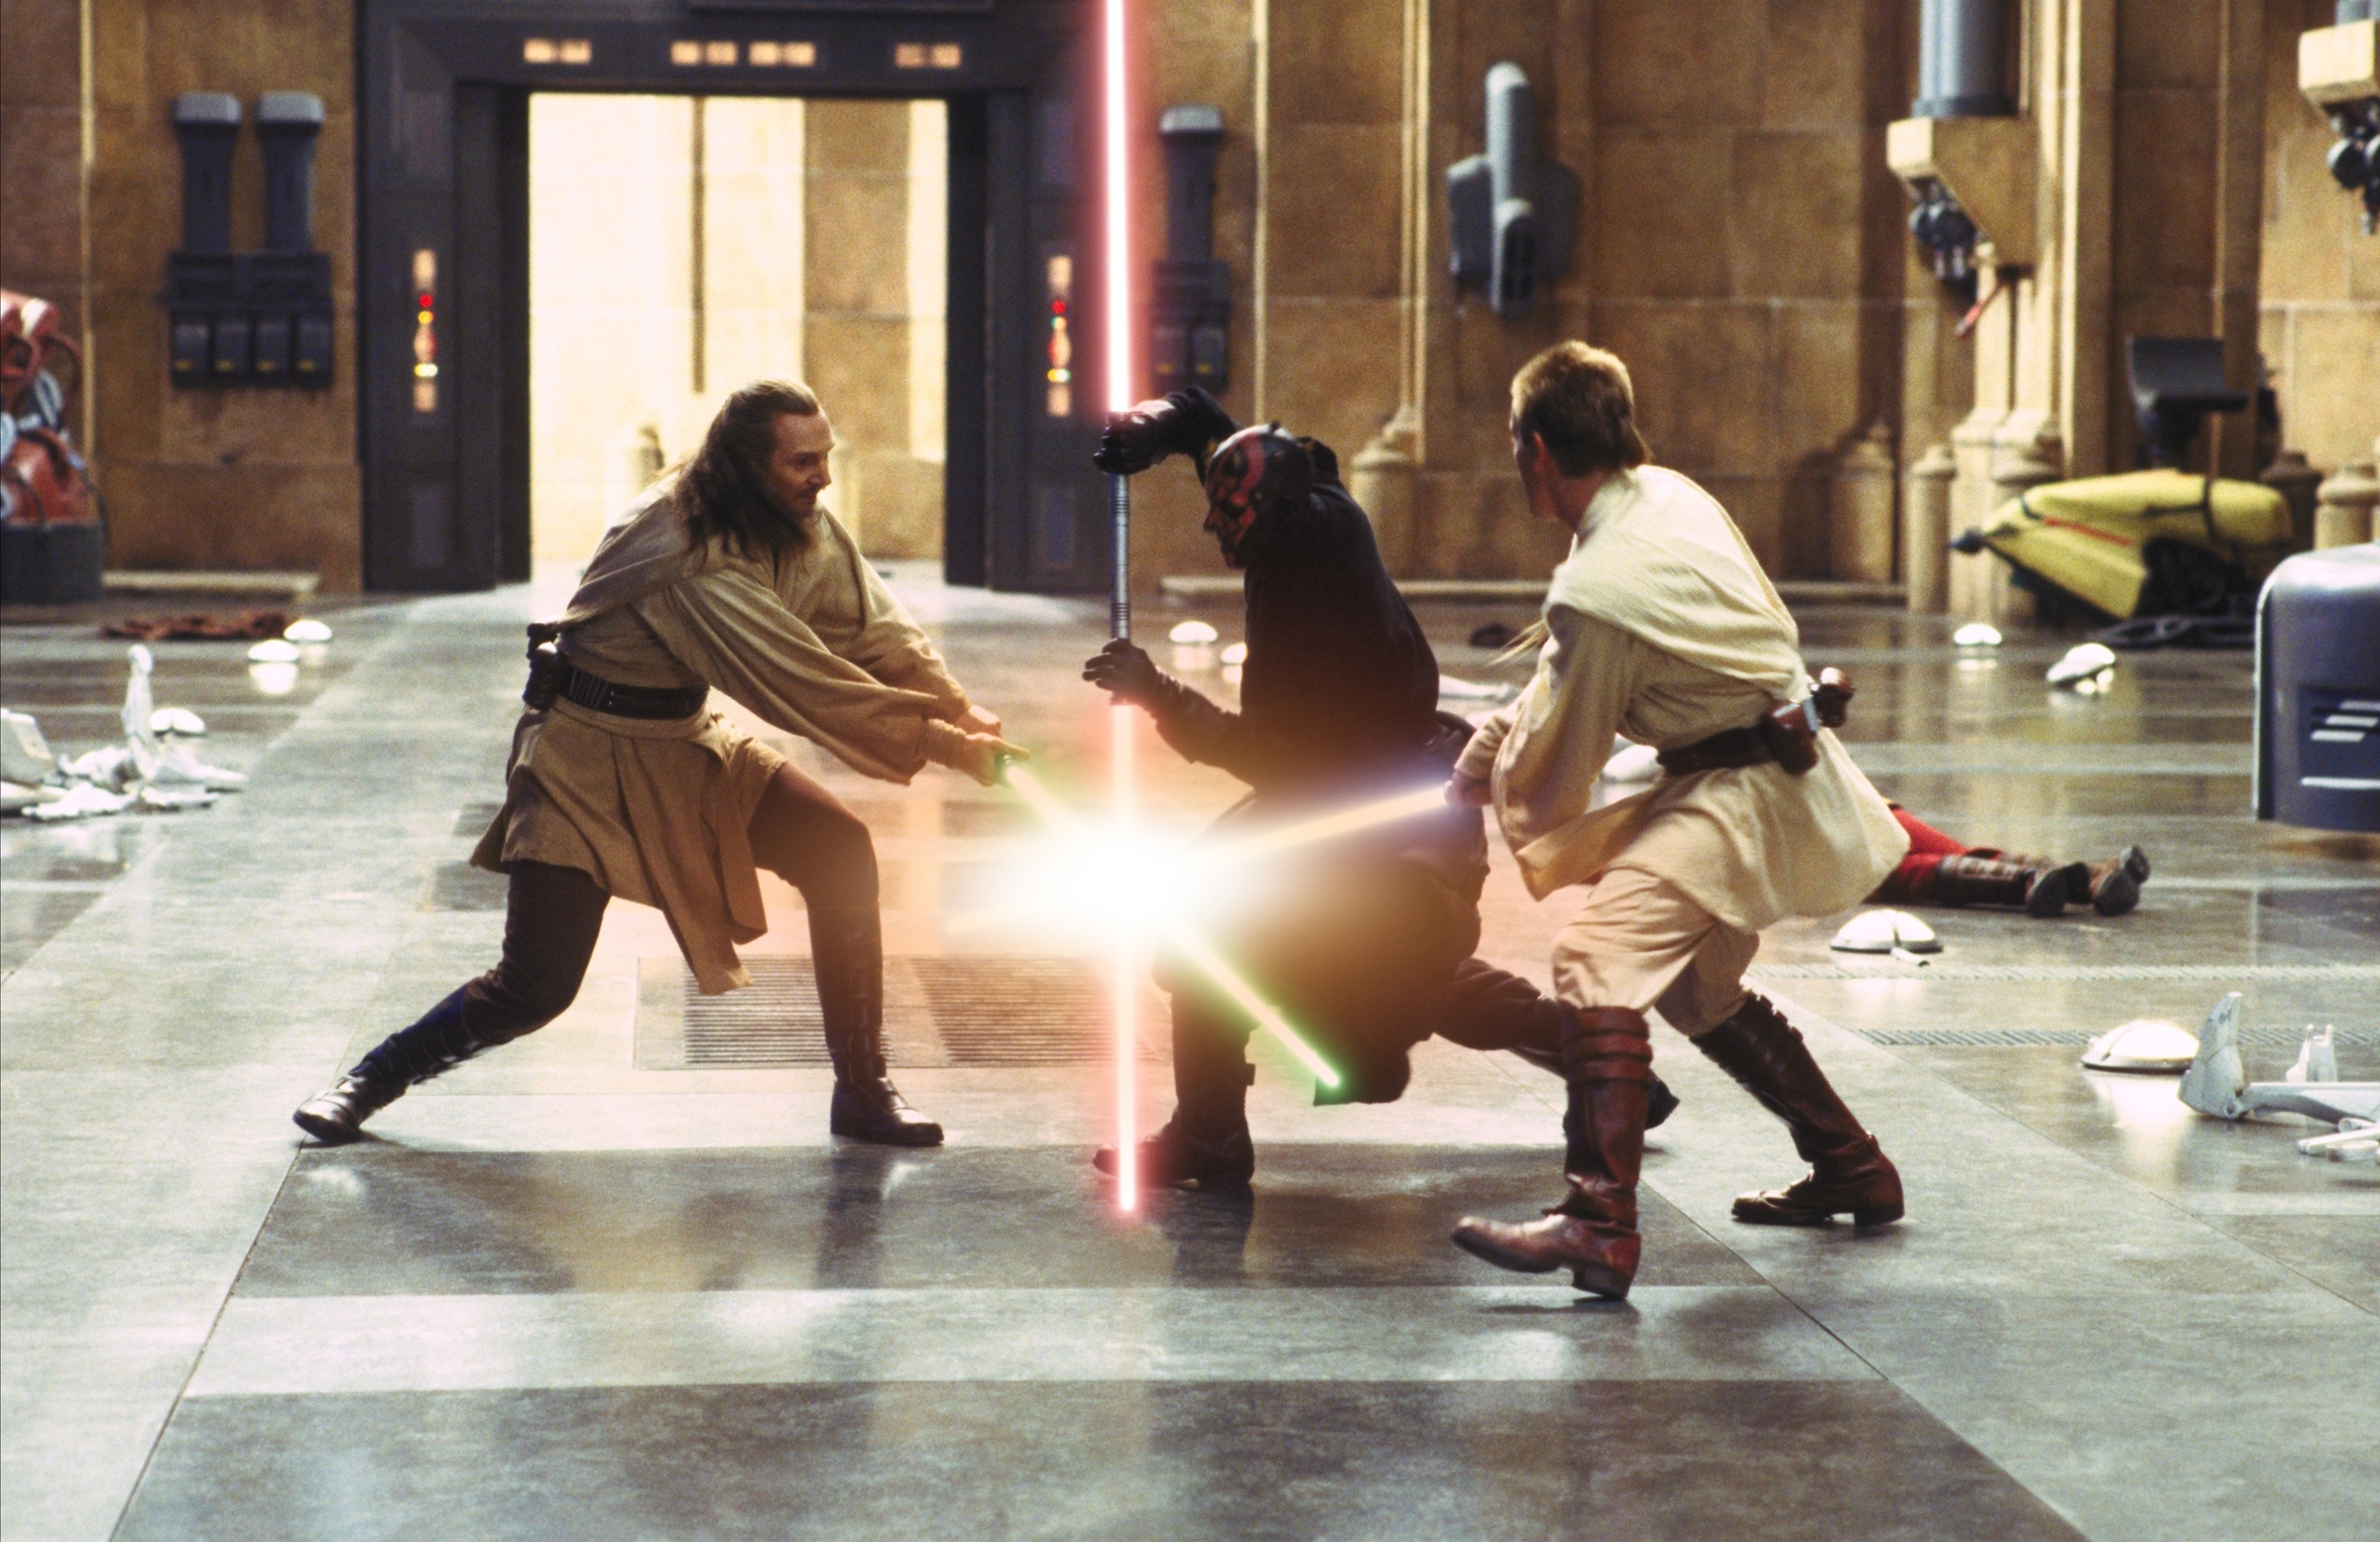 Jedi knights Qui-Gon (Liam Neeson, left) and Obi-Wan (Ewan McGregor) battle Sith Lord Darth Maul.